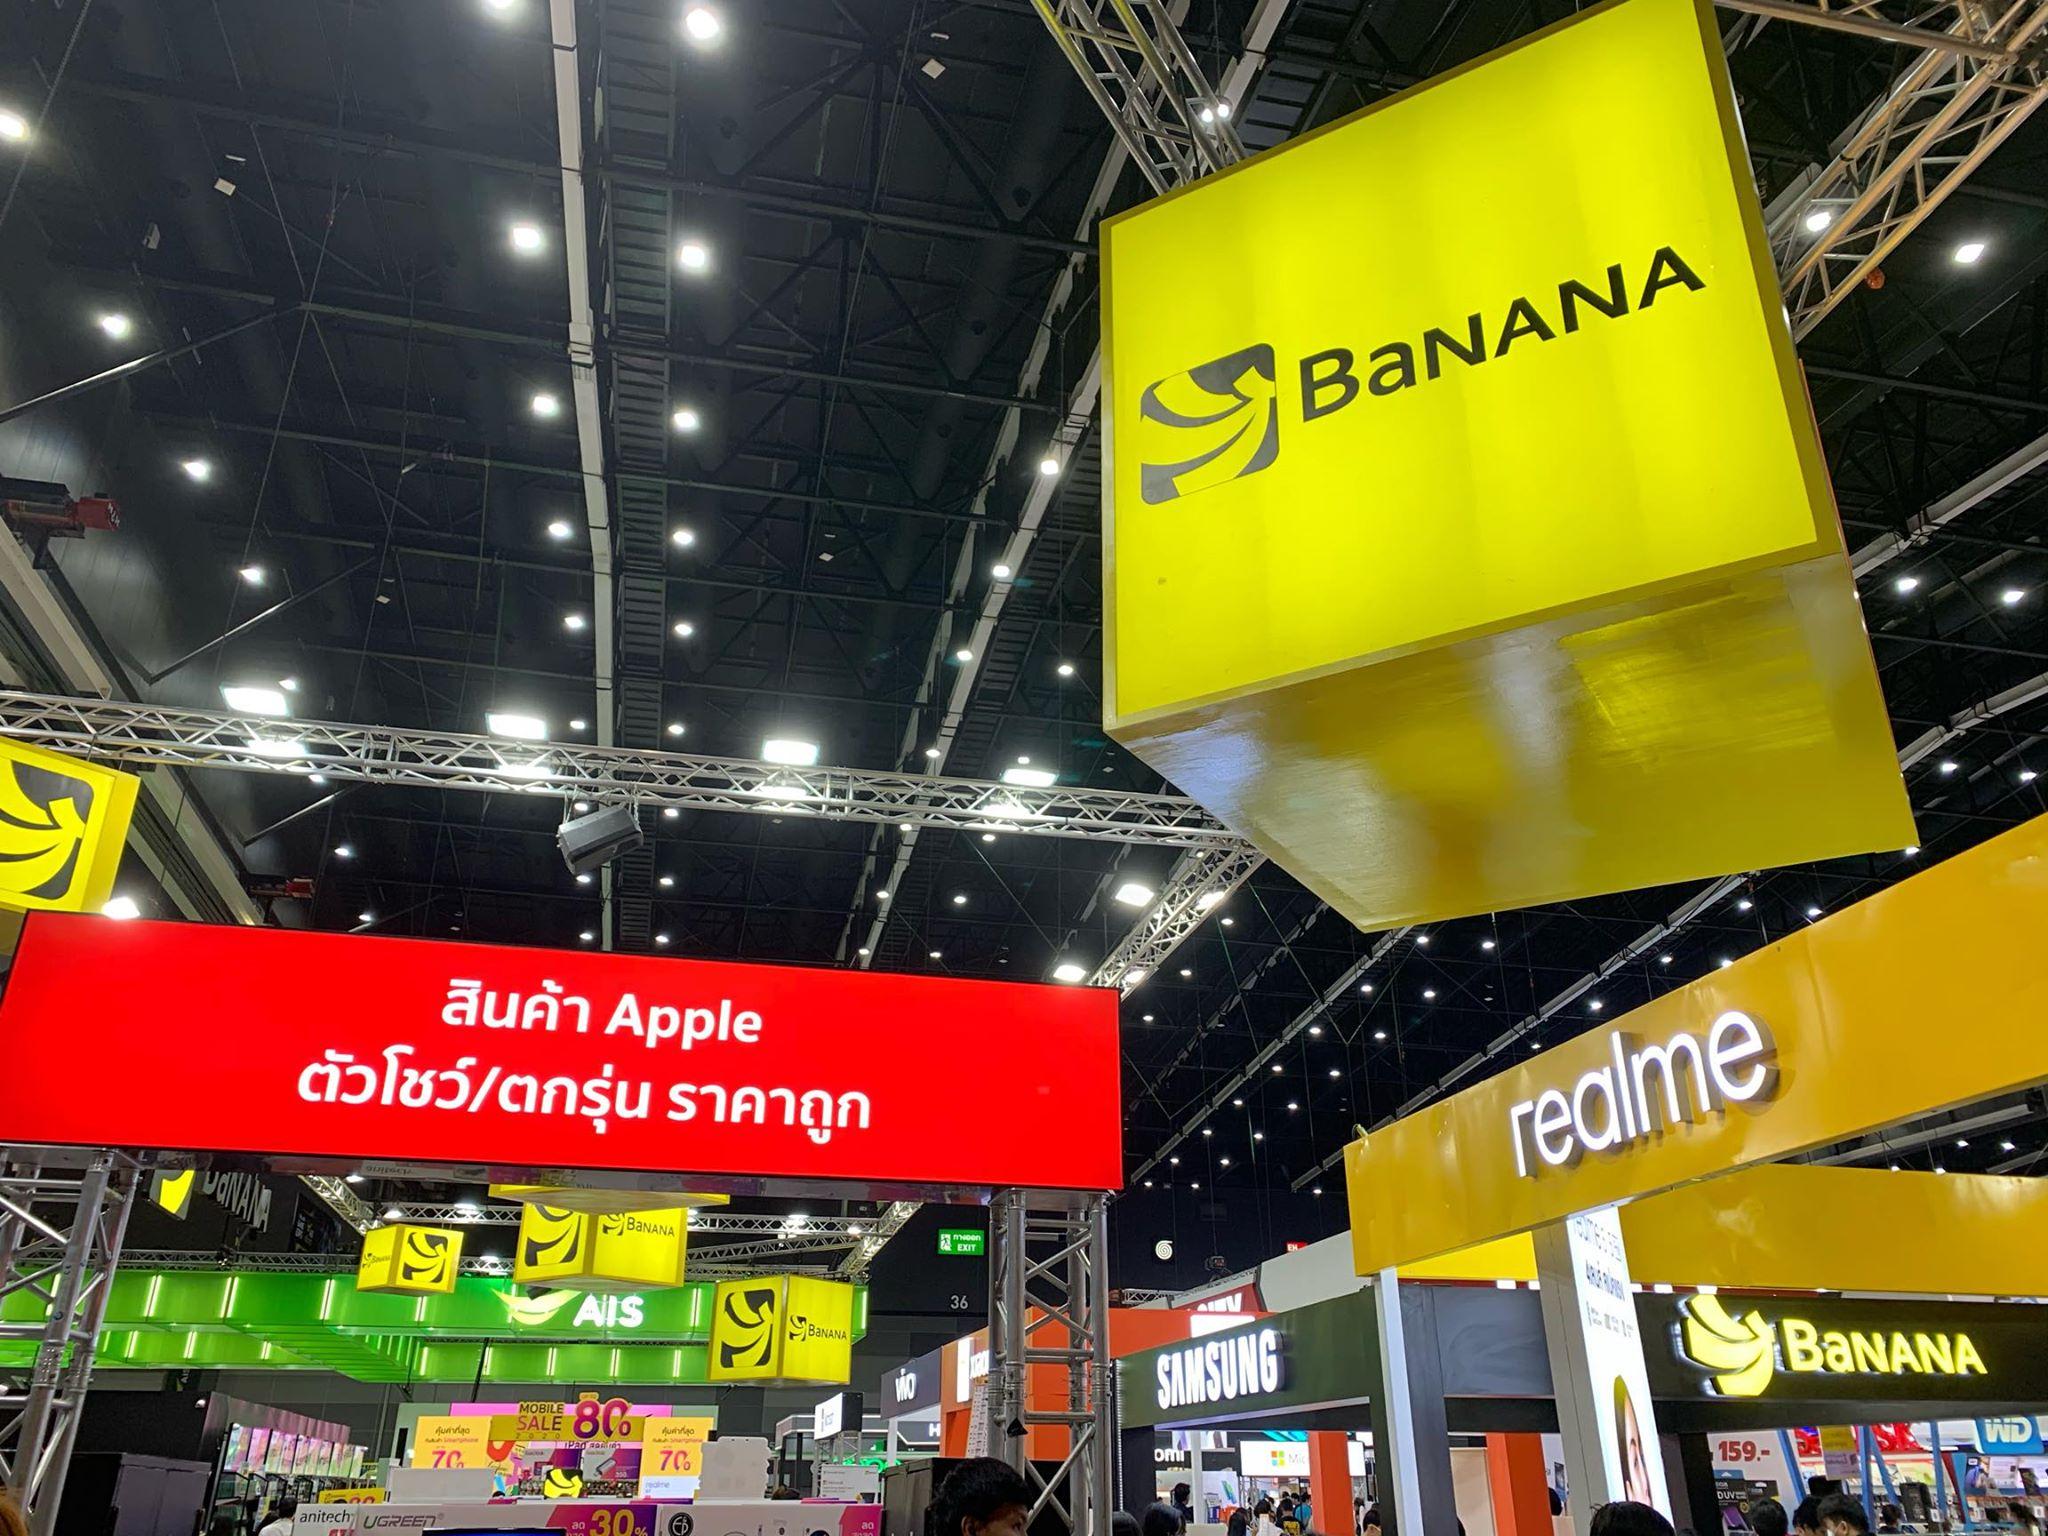 Thailand Game Expo 3112020 16